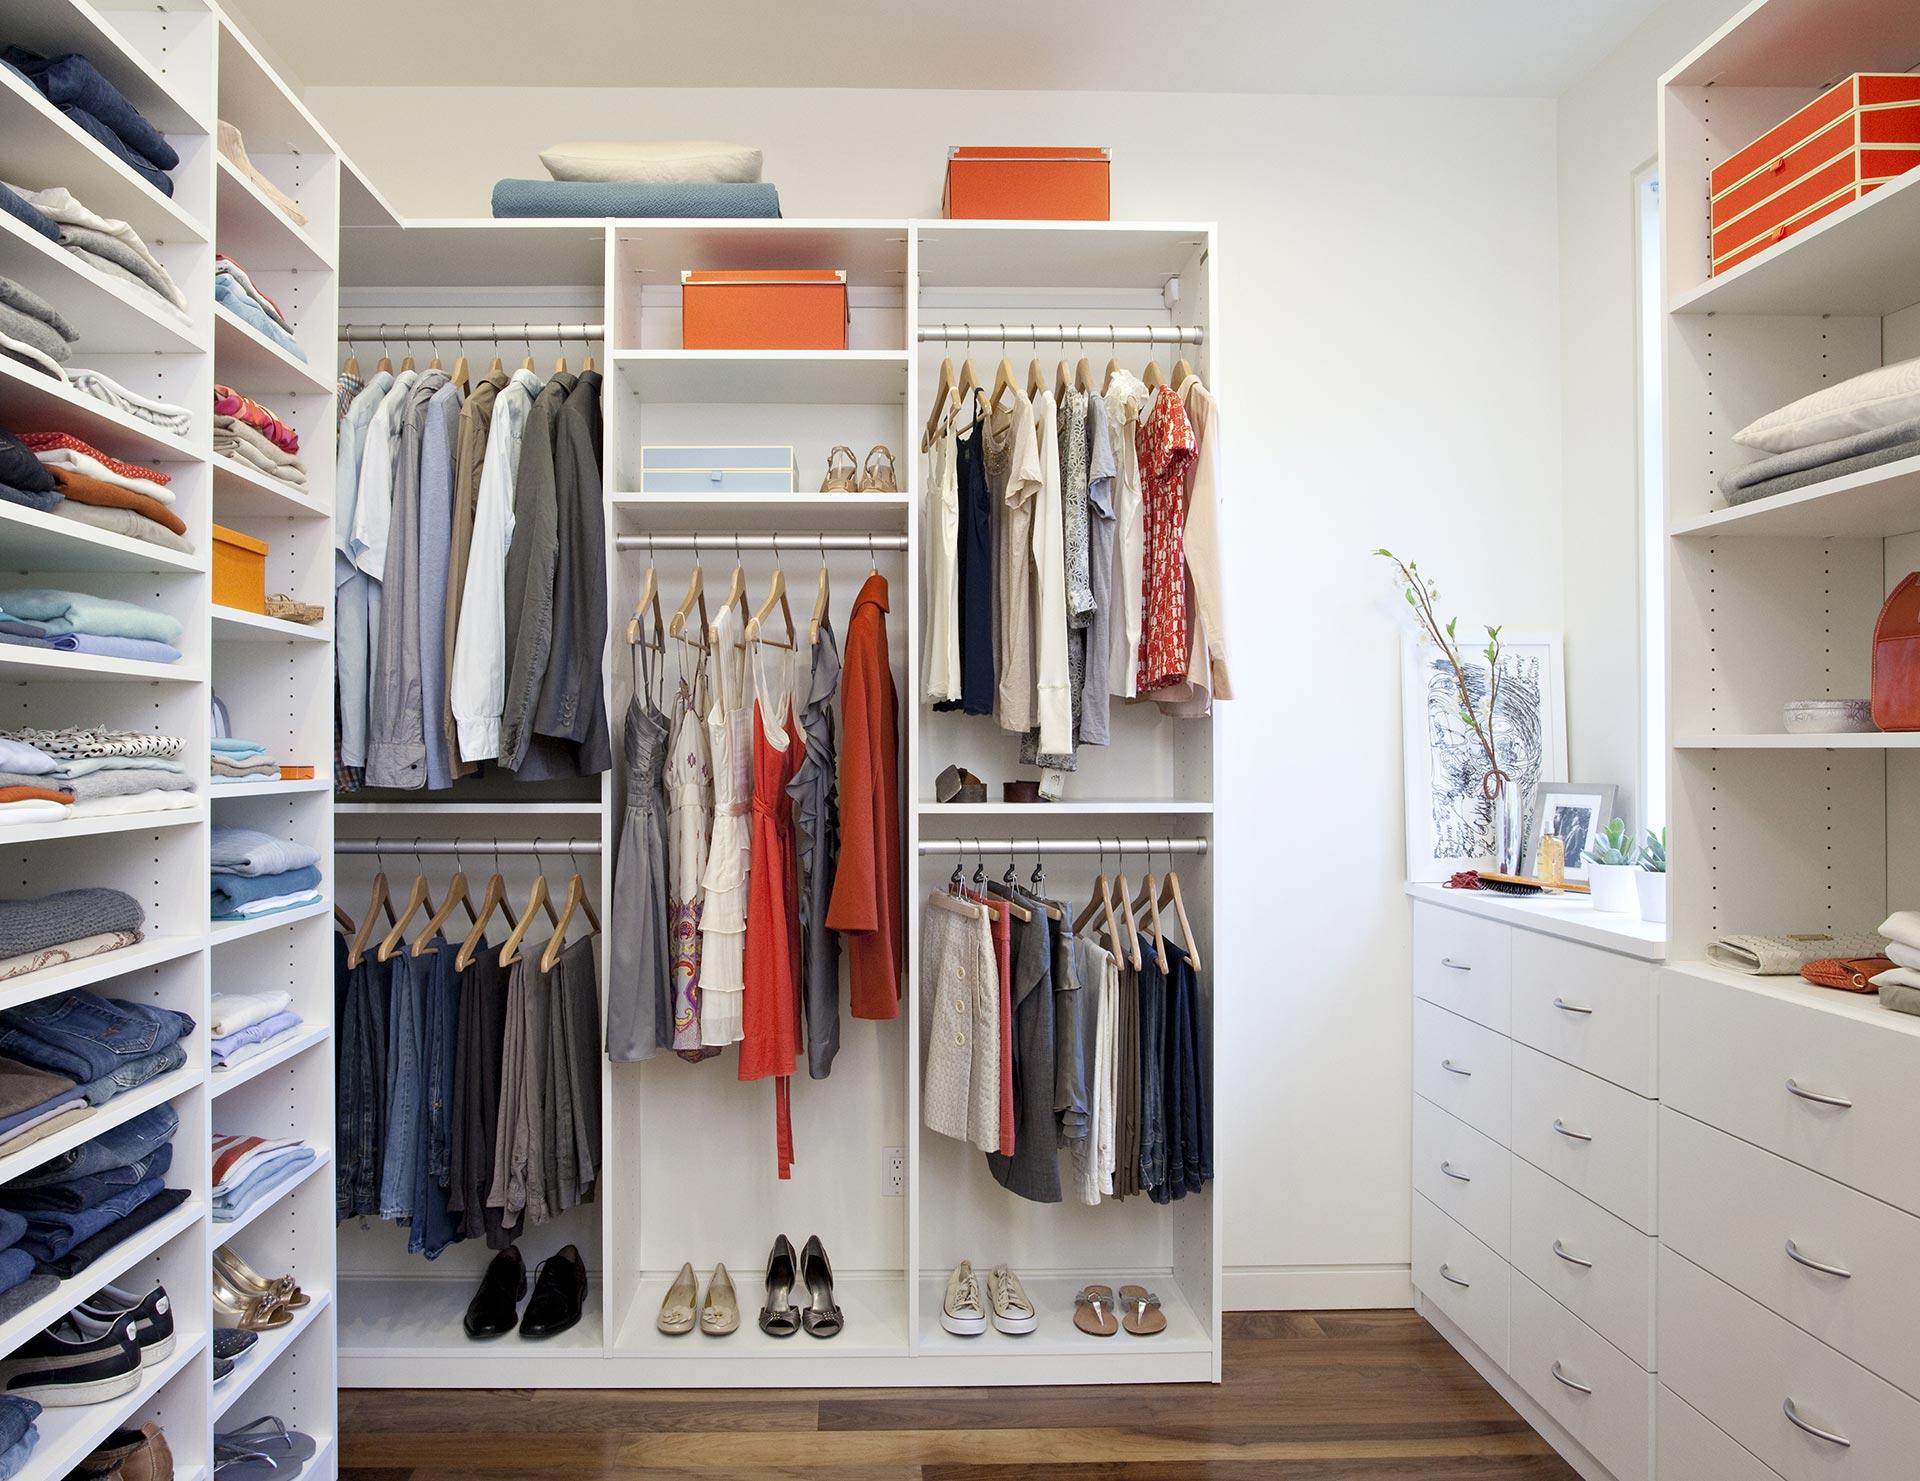 sale retailer 5e6f0 9a32b Walk In Closet Systems | Walk-In Closet Design Ideas ...